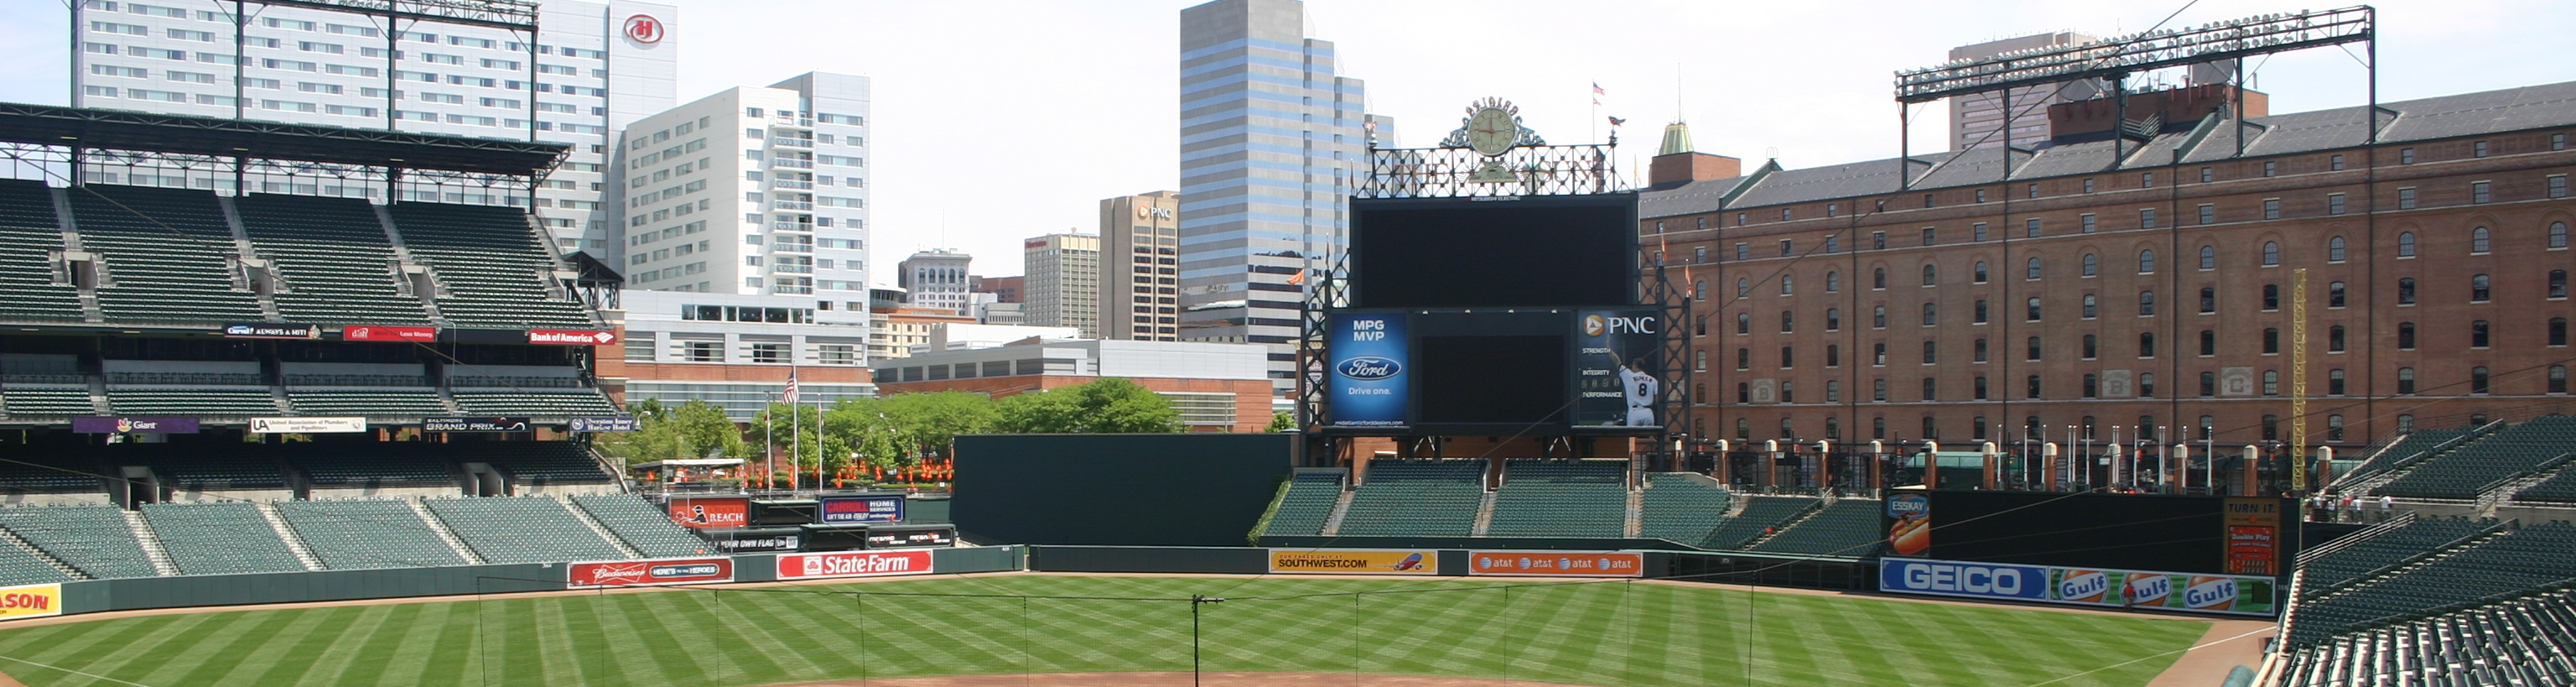 Oriole Park,Camden Yards,east coast baseball tours,baseball trips